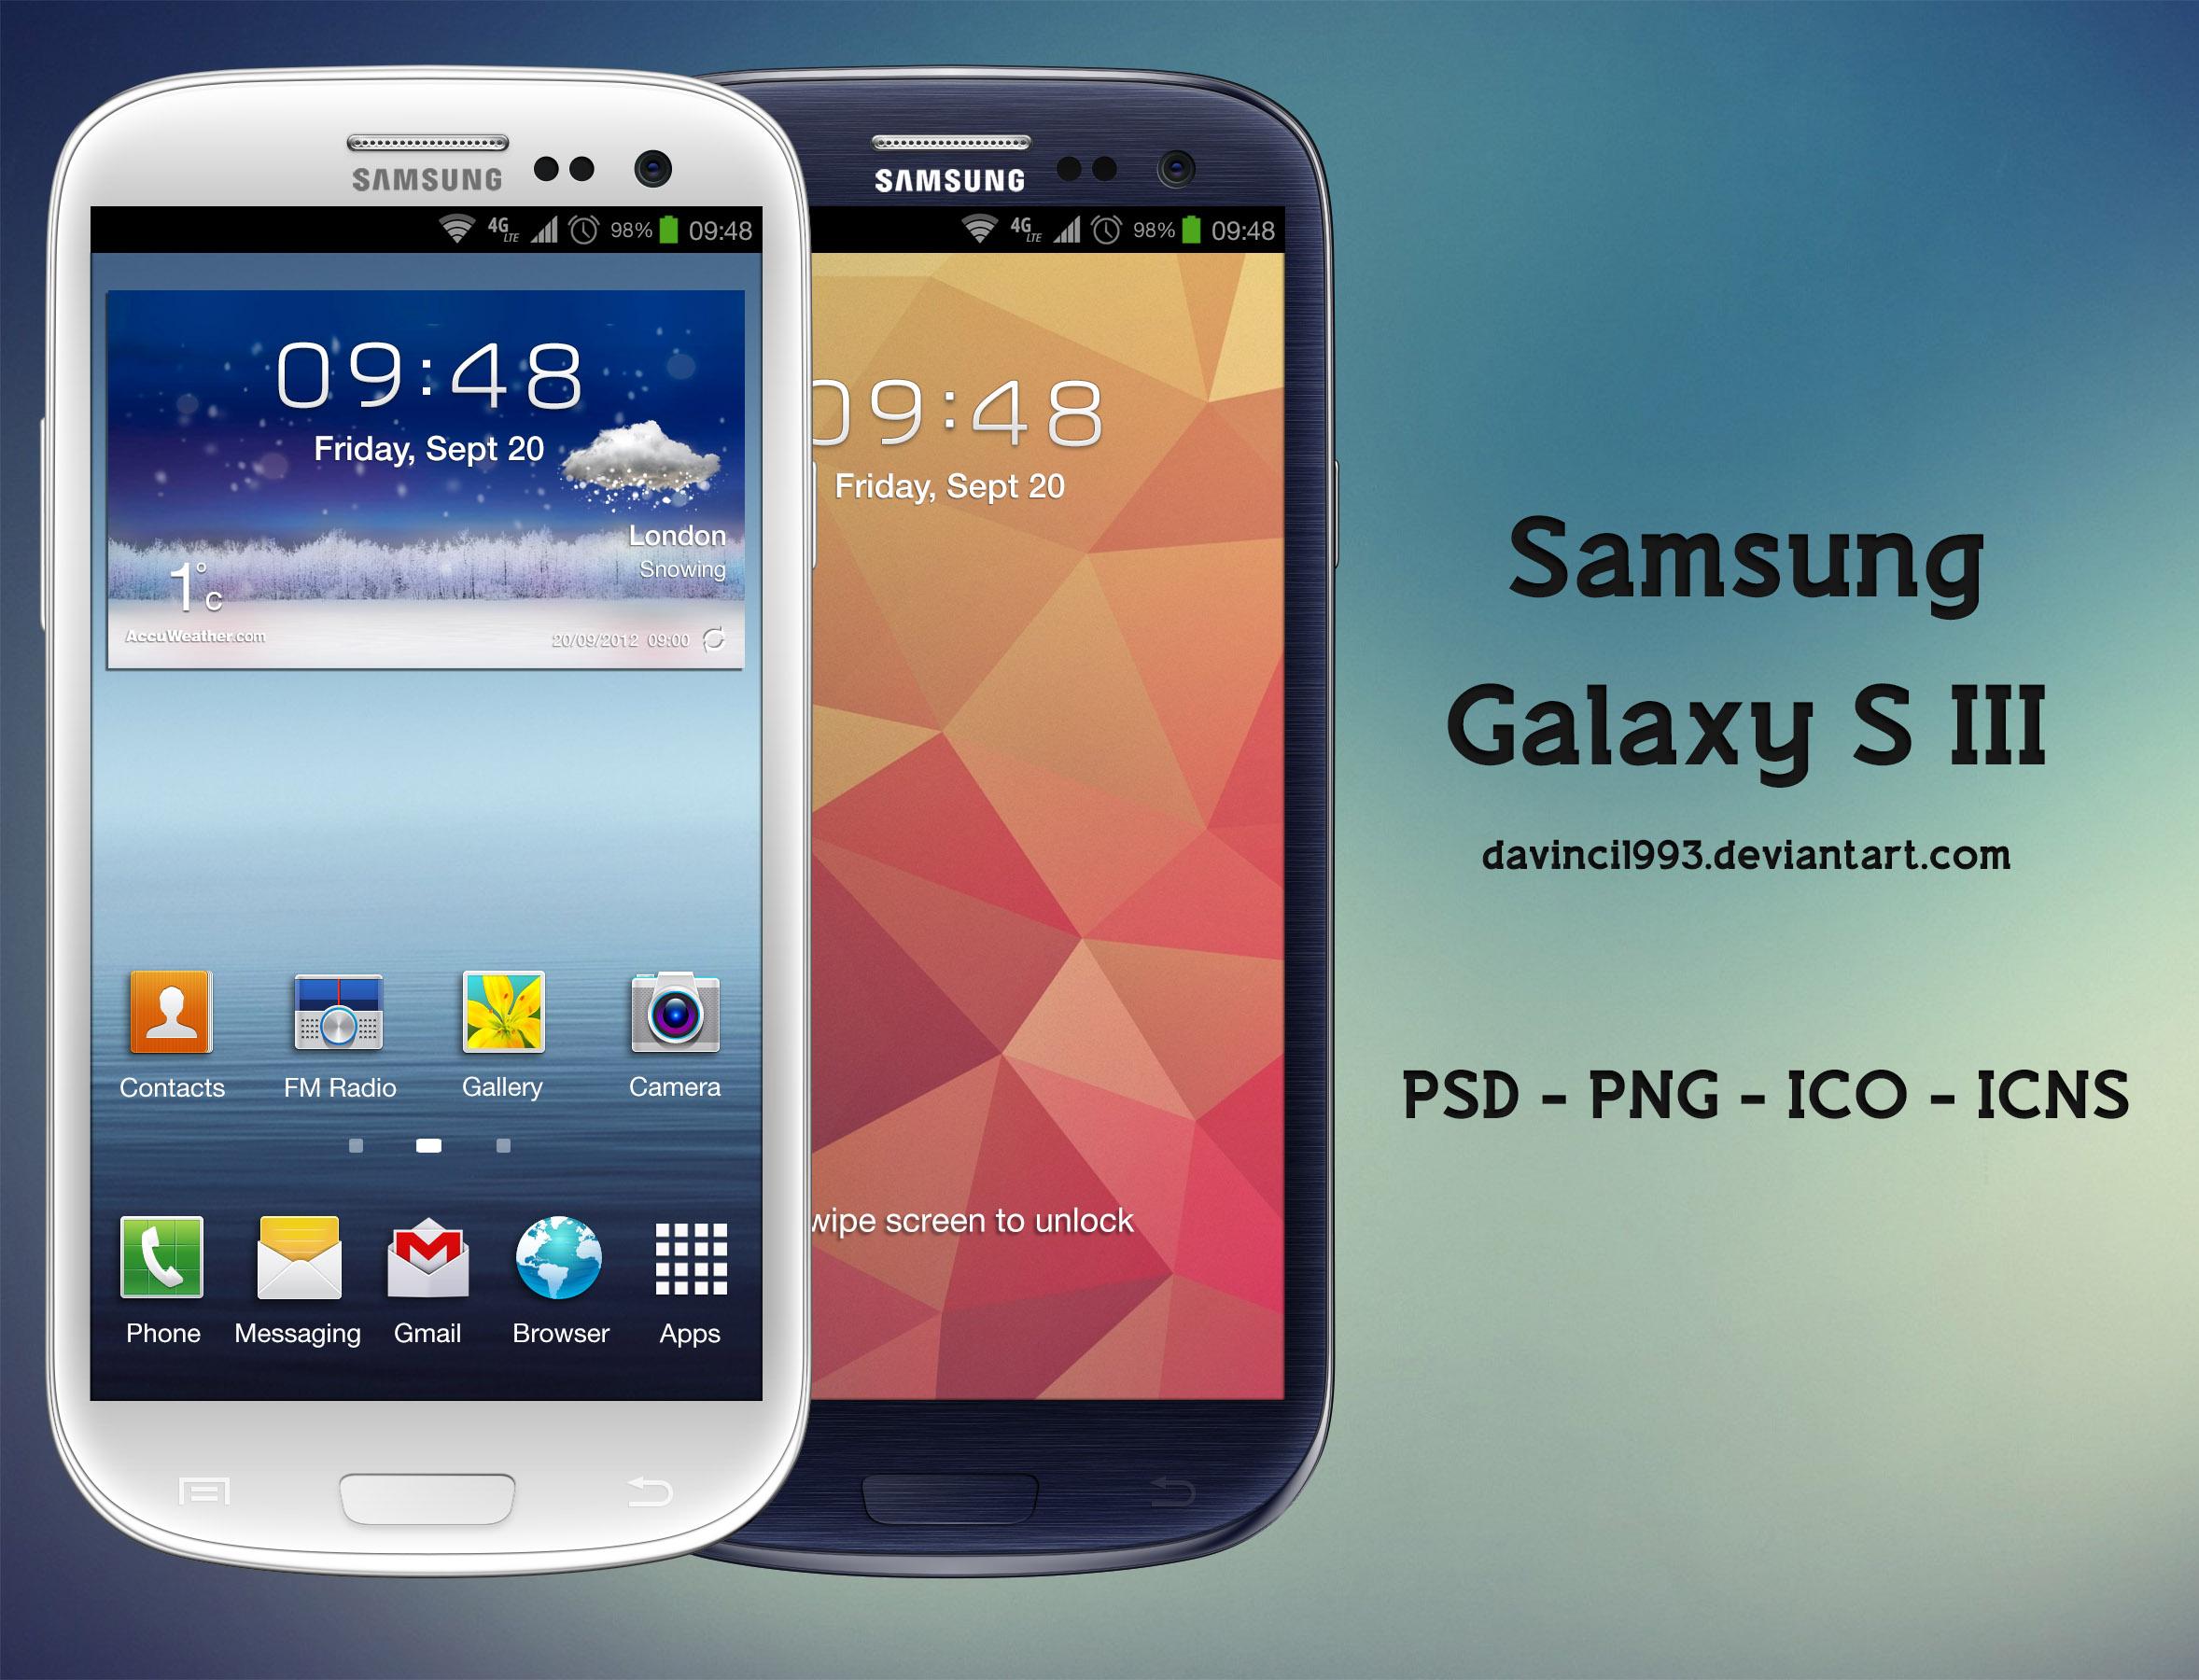 Samsung Galaxy S III: PSD | PNG | ICO | ICNS